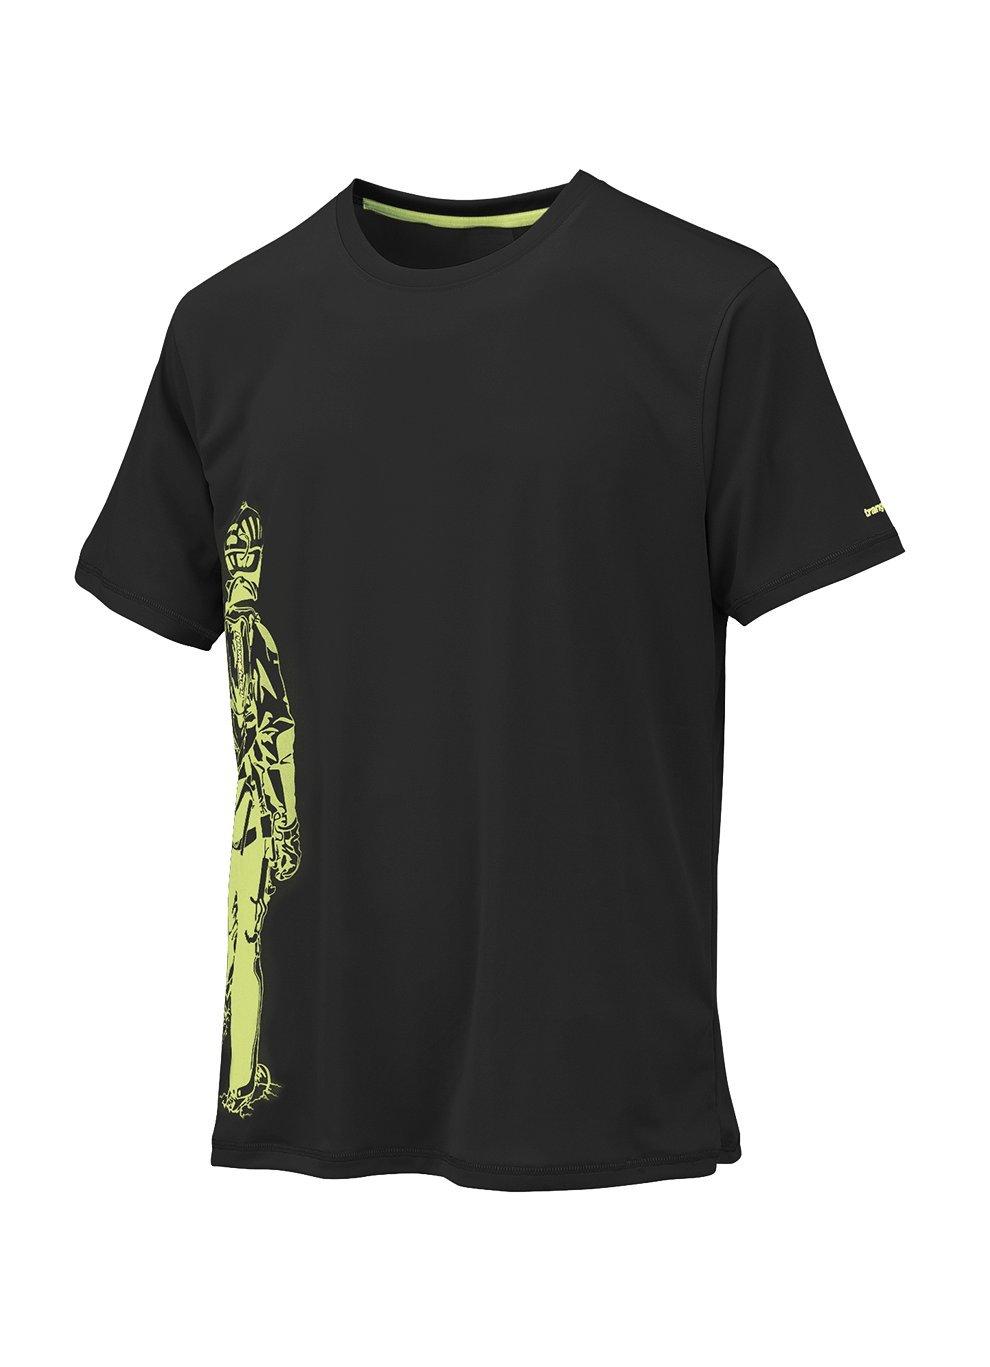 TRANGOWORLD Cordov DT Camiseta, Hombre